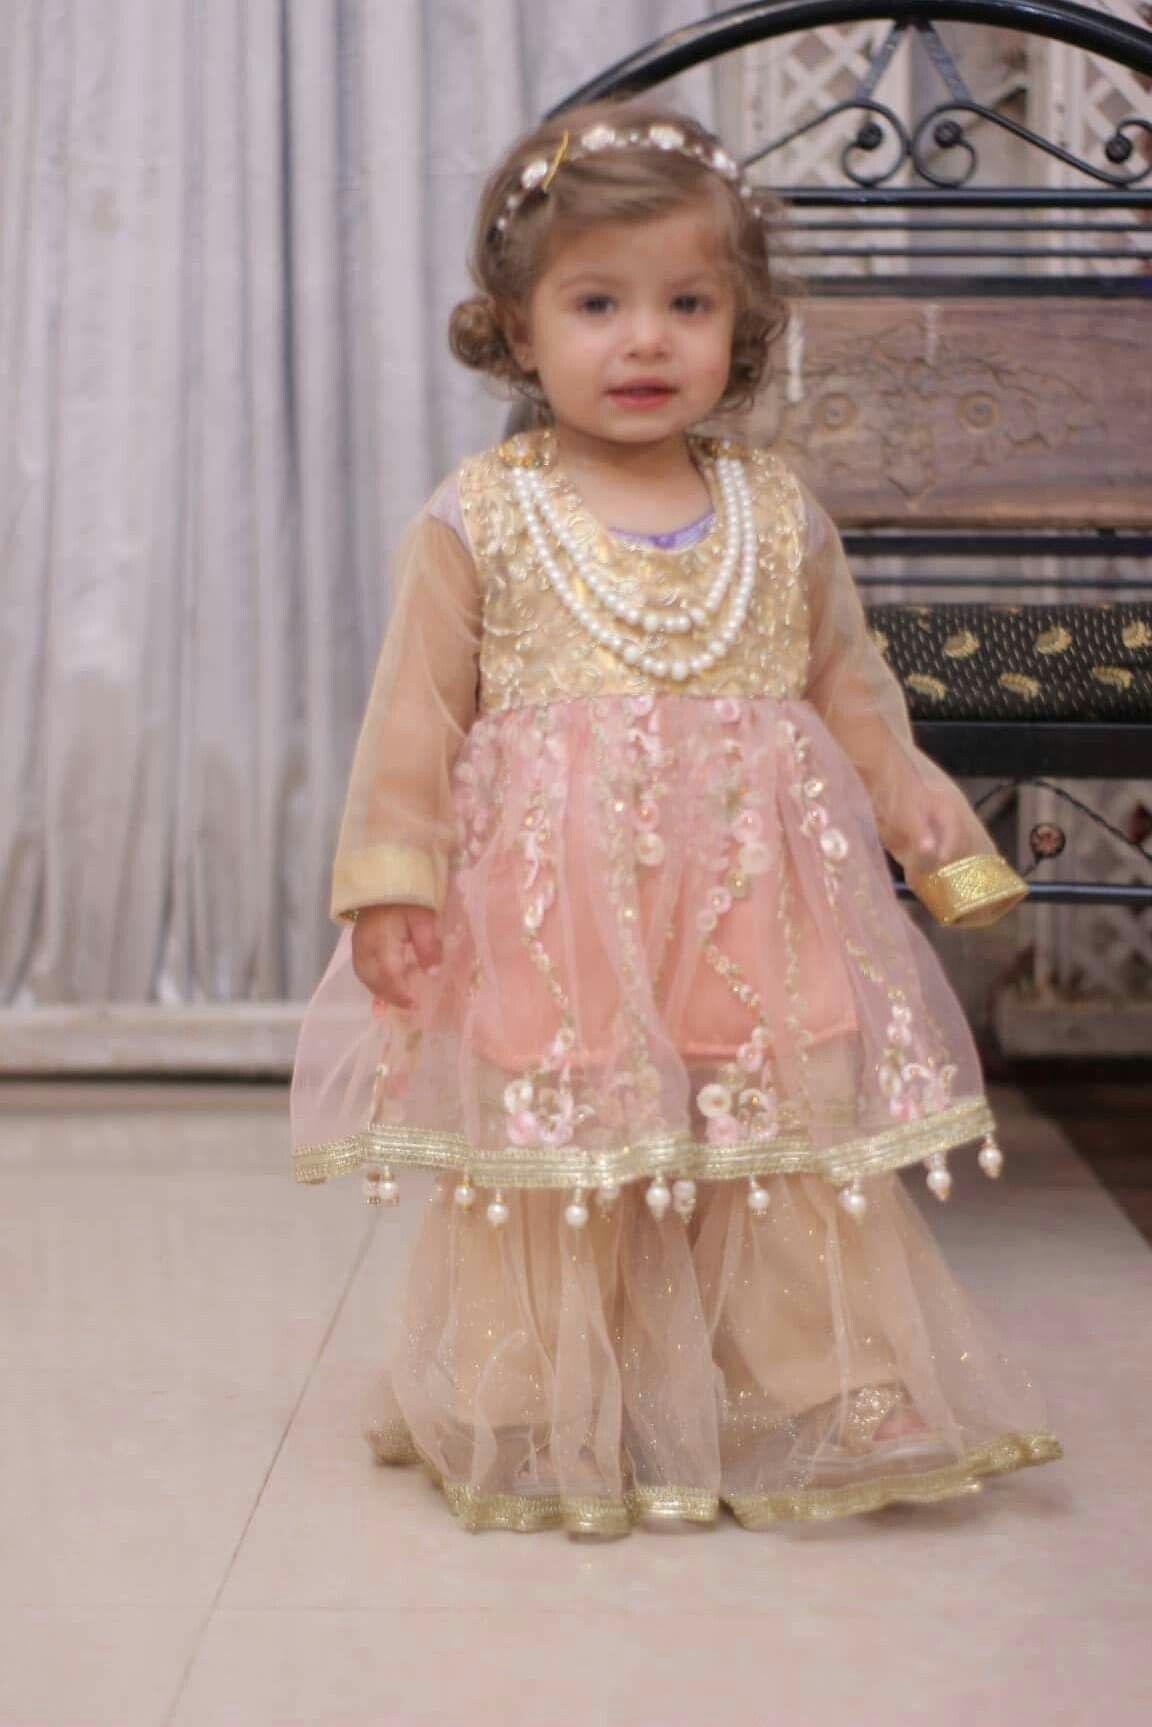 fancy wedding baby dress design